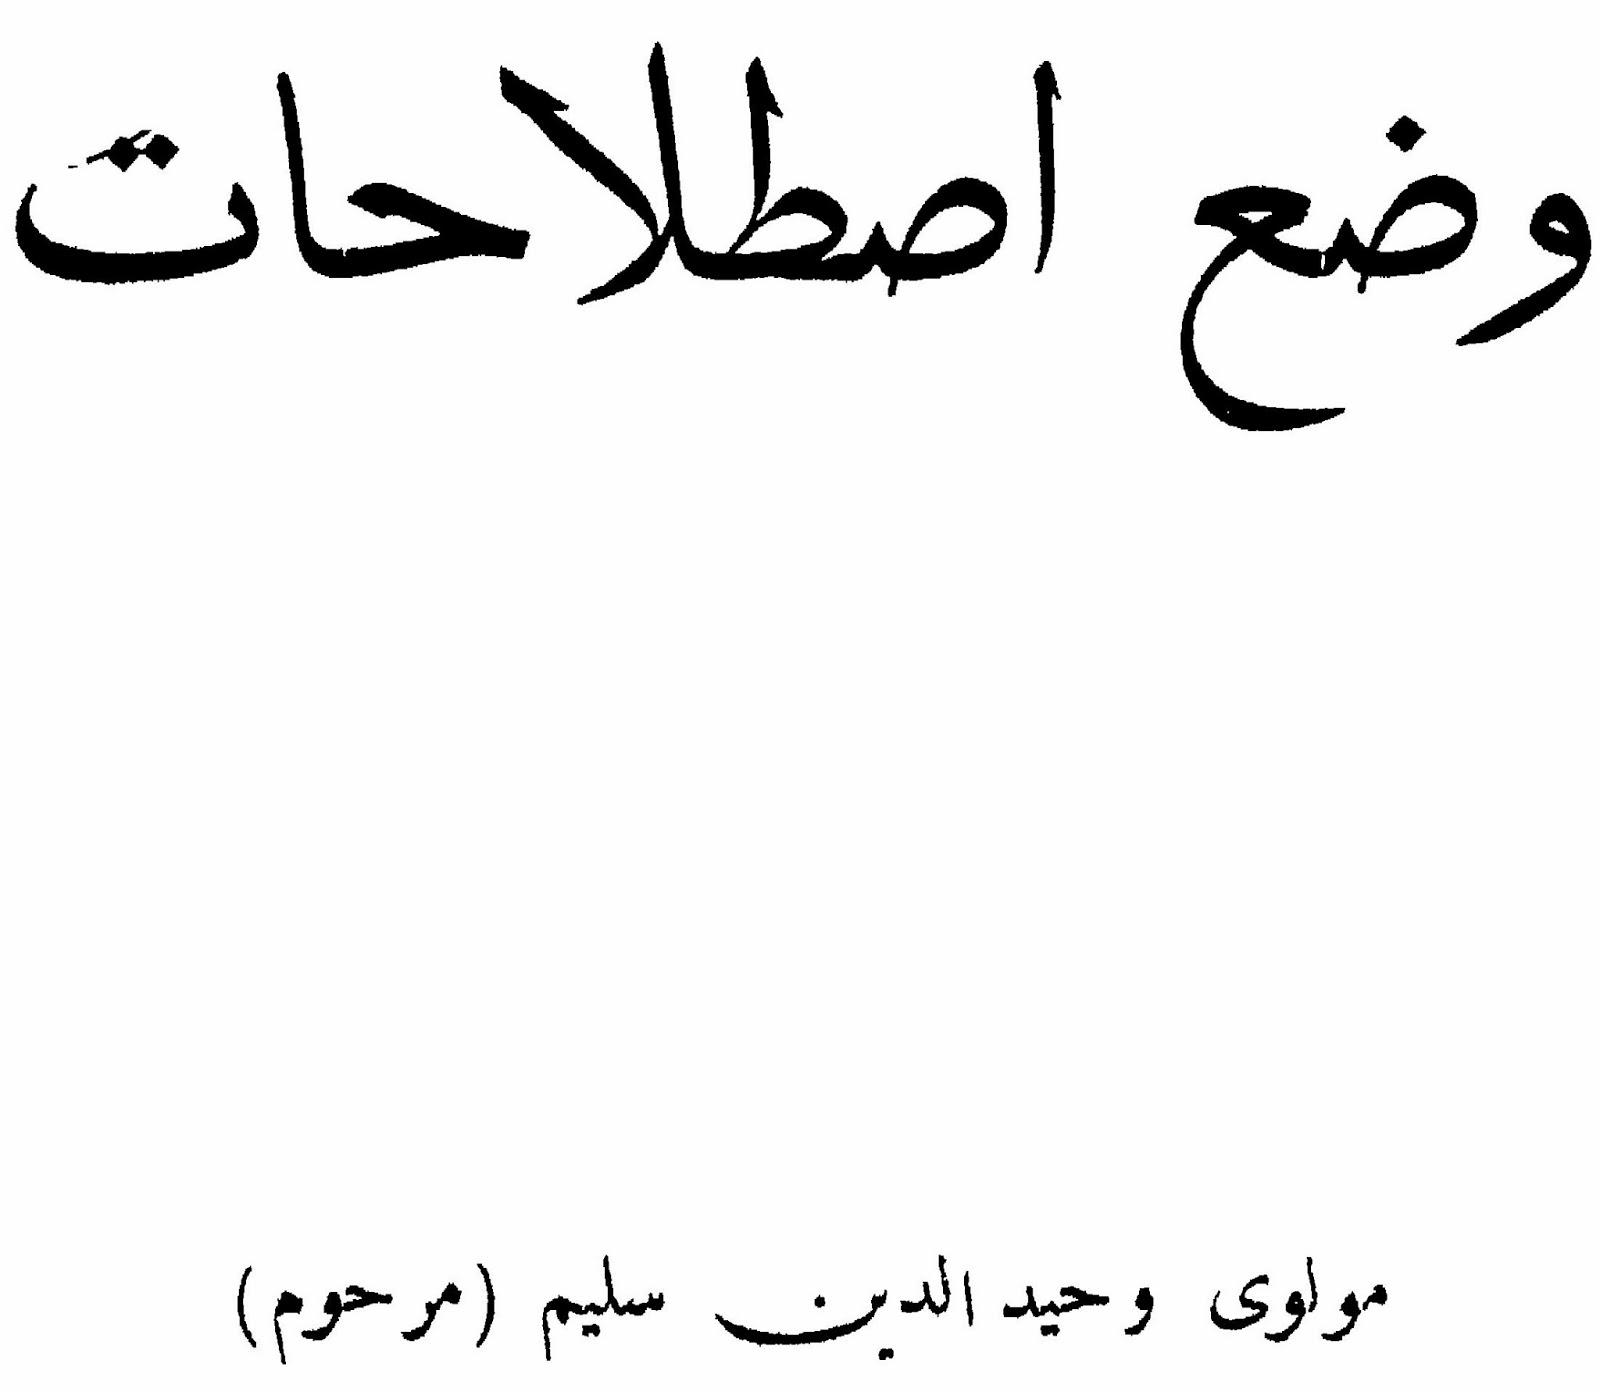 http://books.google.com.pk/books?id=TtZNAgAAQBAJ&lpg=PP1&pg=PP1#v=onepage&q&f=false